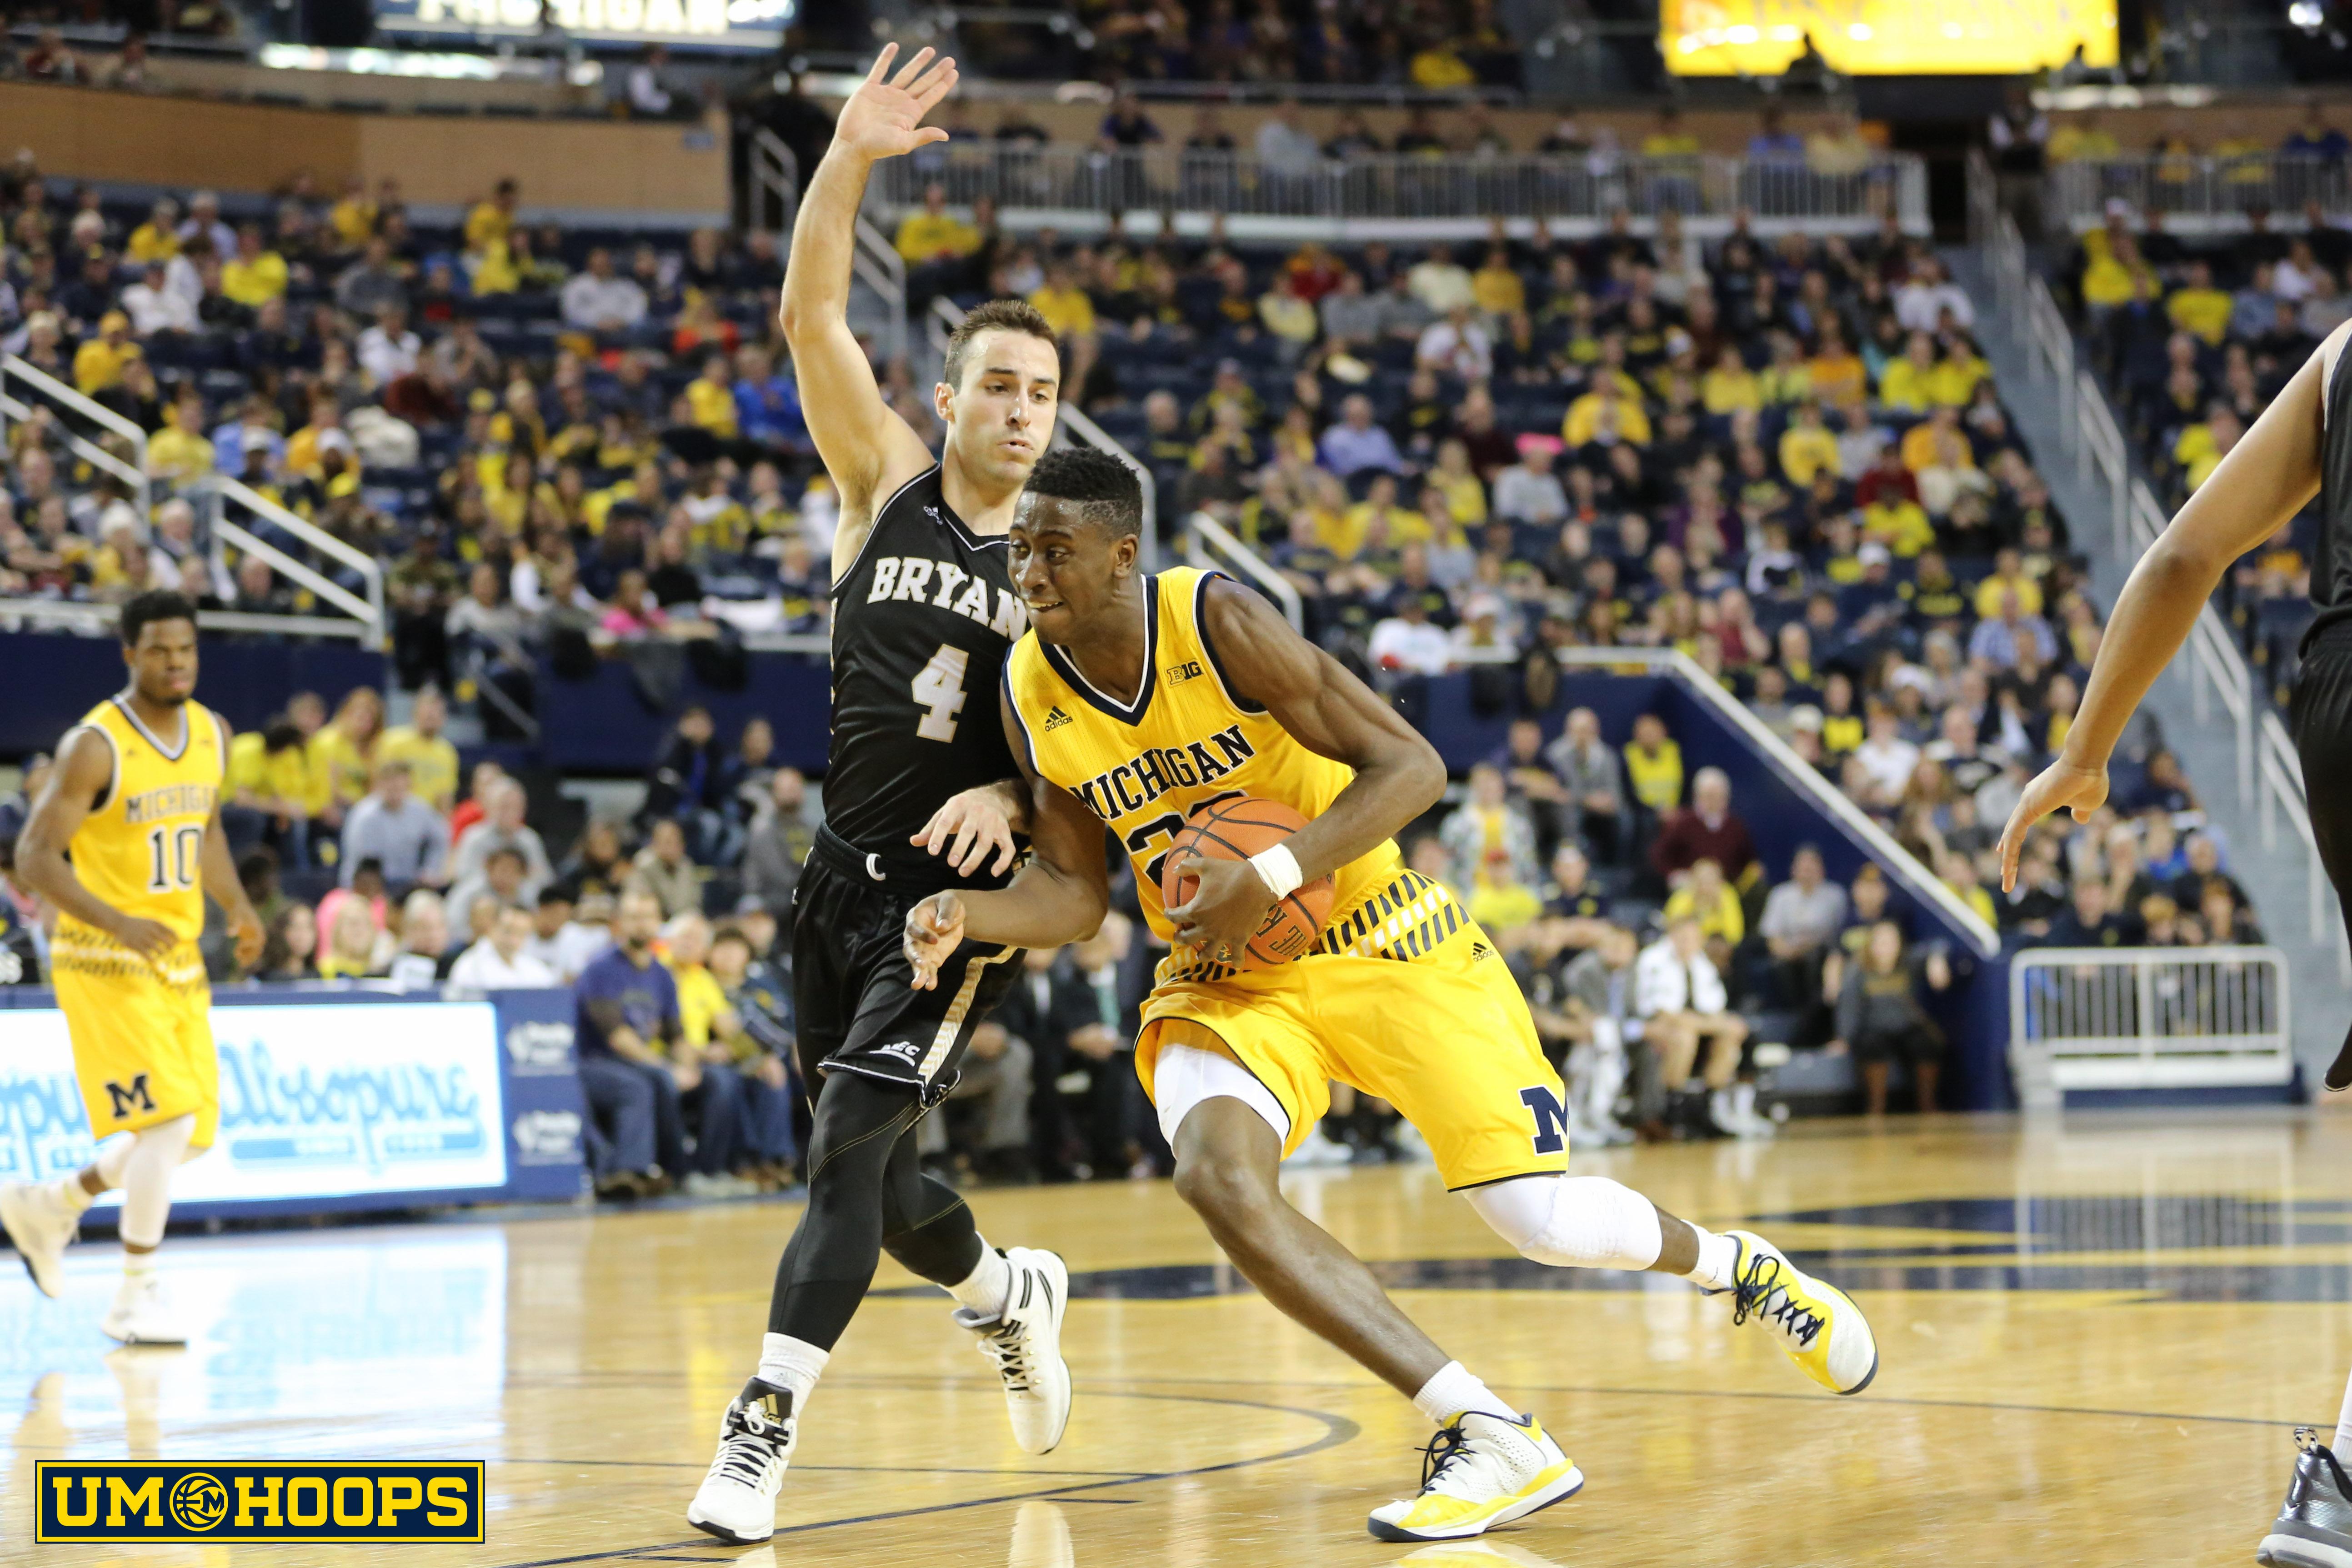 Michigan 96, Bryant 60-17